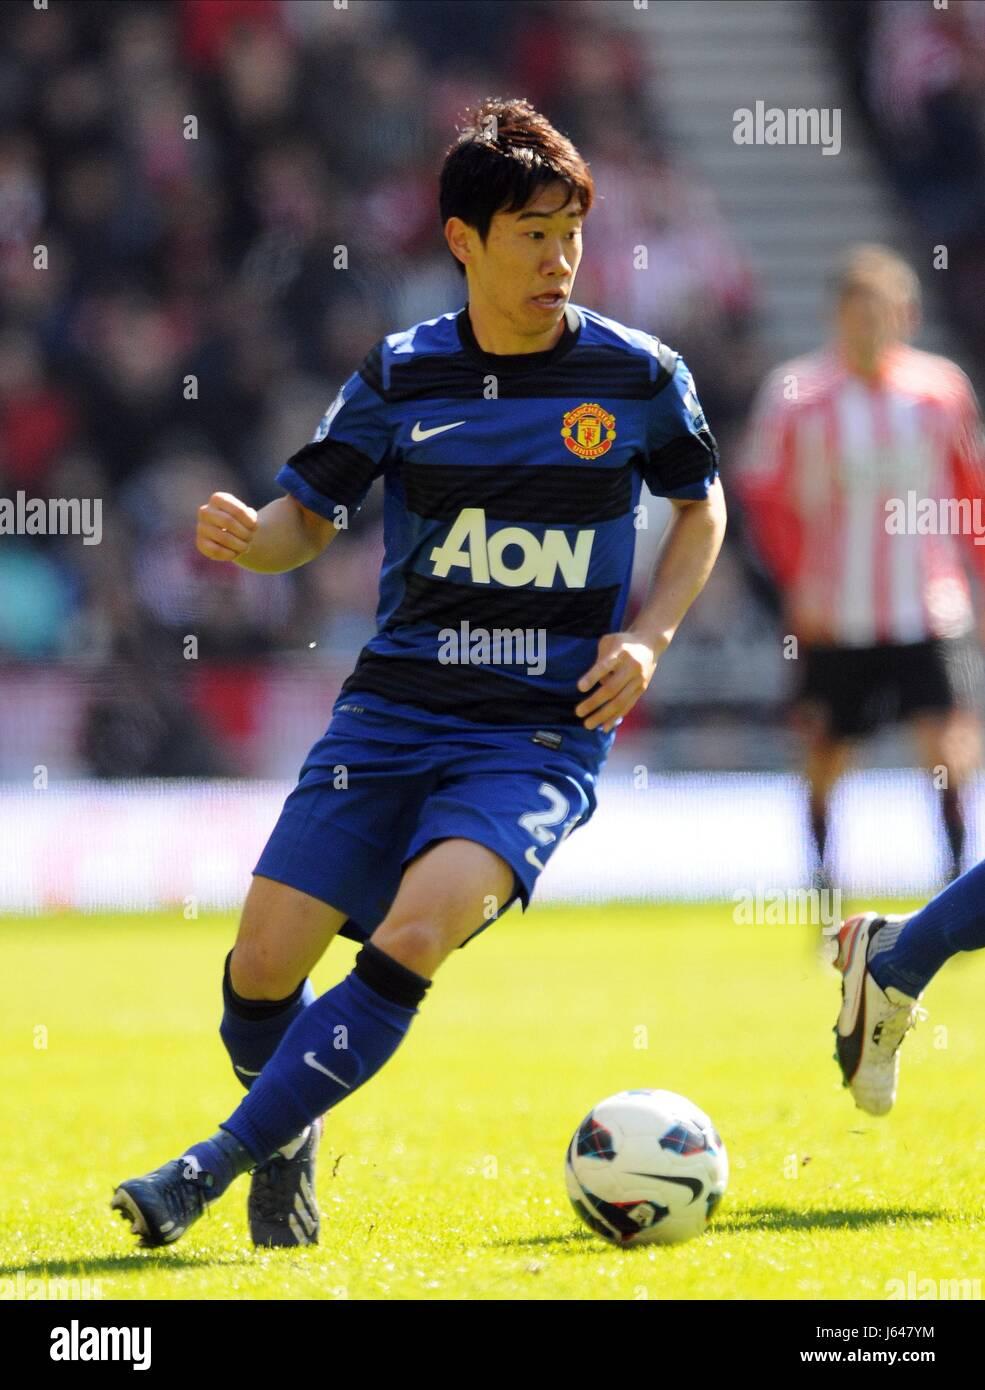 SHINJI KAGAWA MANCHESTER UNITED FC STADIUM OF LIGHT SUNDERLAND ENGLAND 30 March 2013 - Stock Image